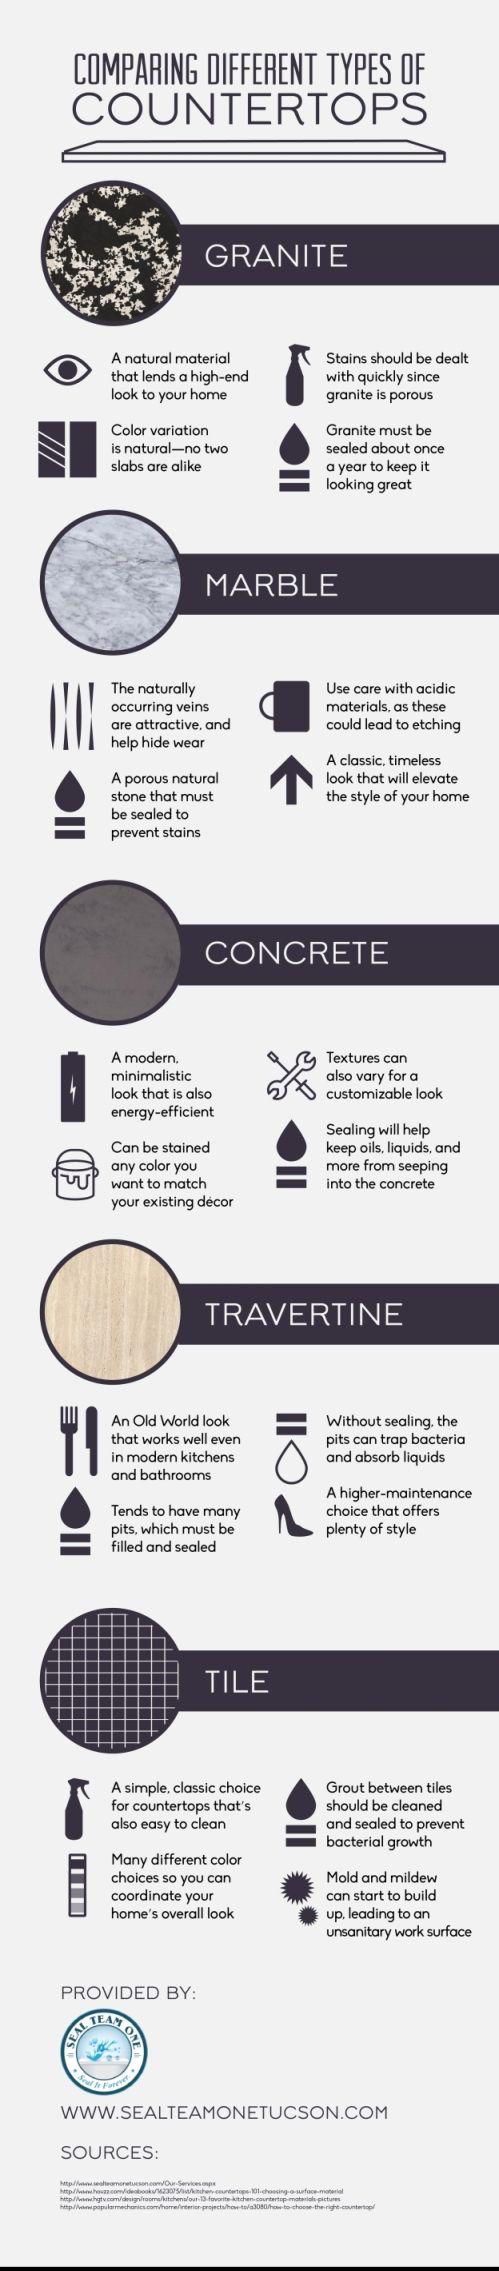 grout repair, granite sealer, stone sealing, grout cleaning, tile restoration…